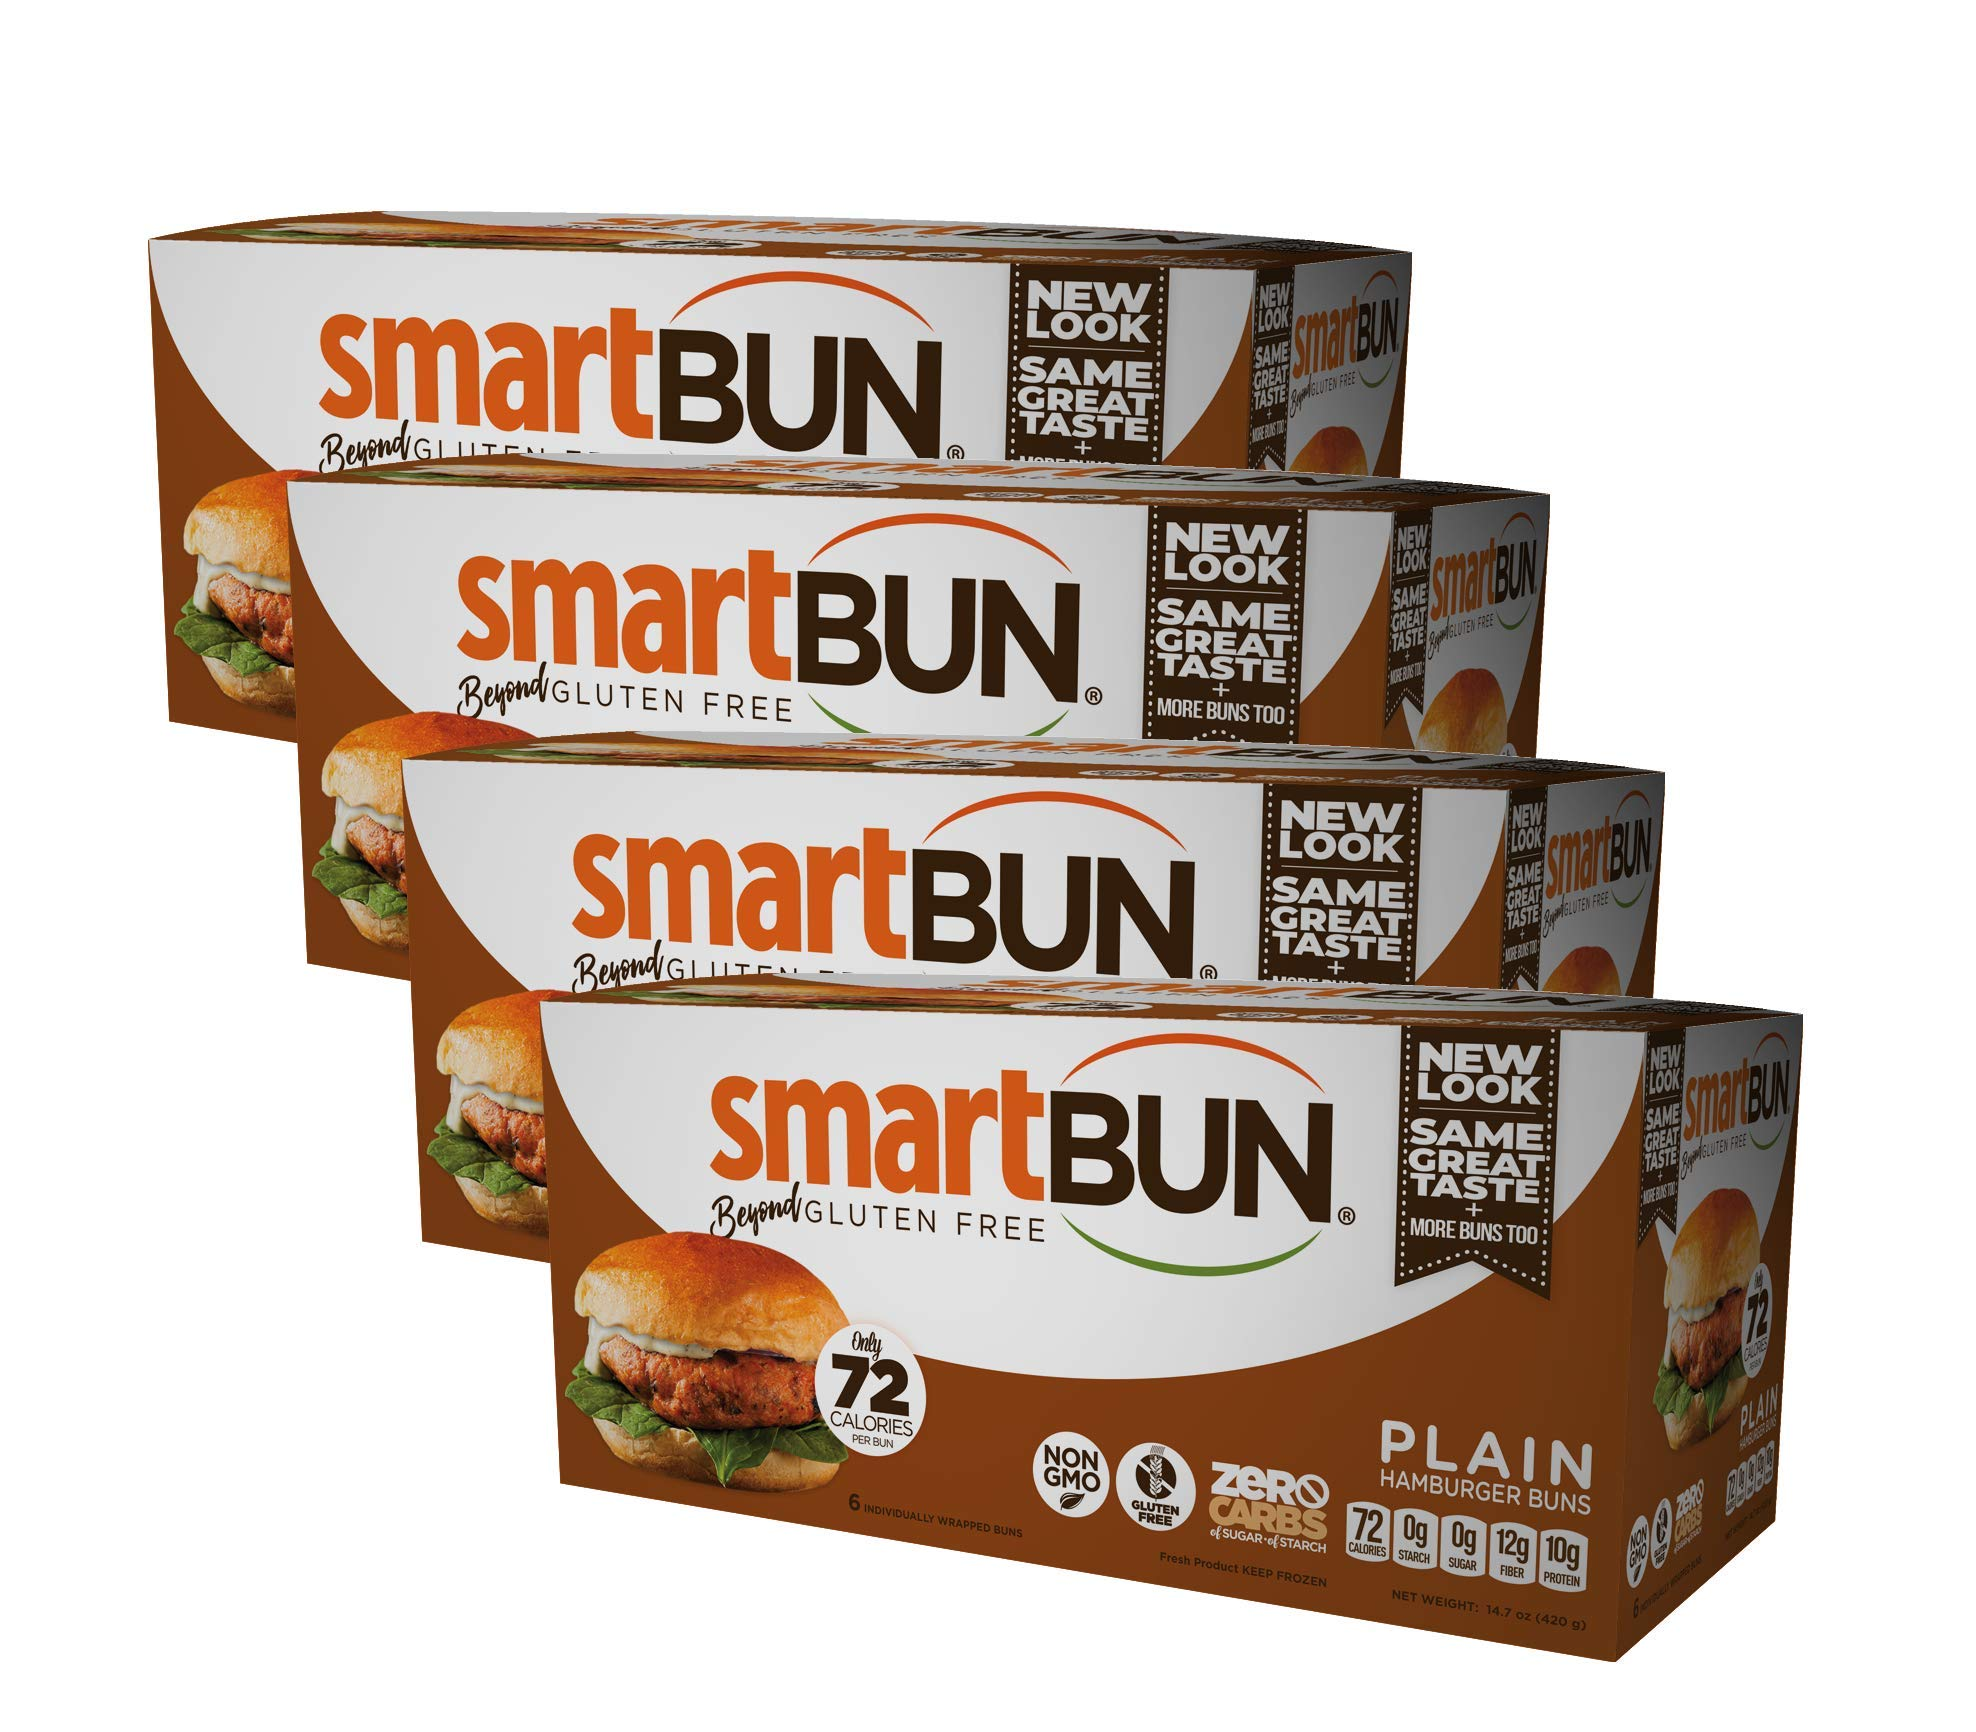 Plain Smartbun Gluten Free, ZERO CARB of sugar of starch, Hamburger Buns- 24 pack by SmartBUN